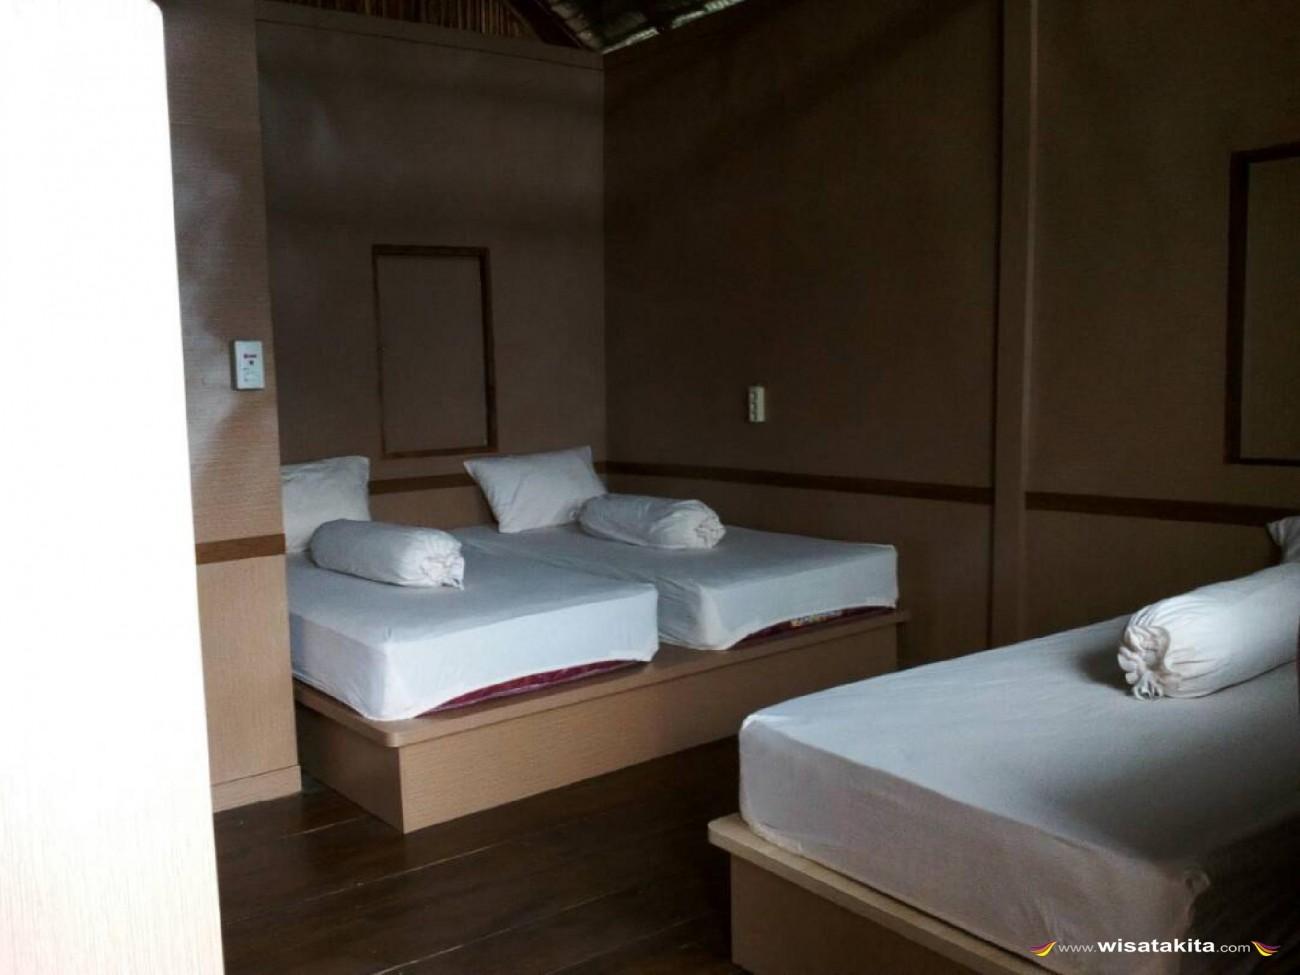 Labengki Nirwana Resort Tempat Tidur Cottage Air